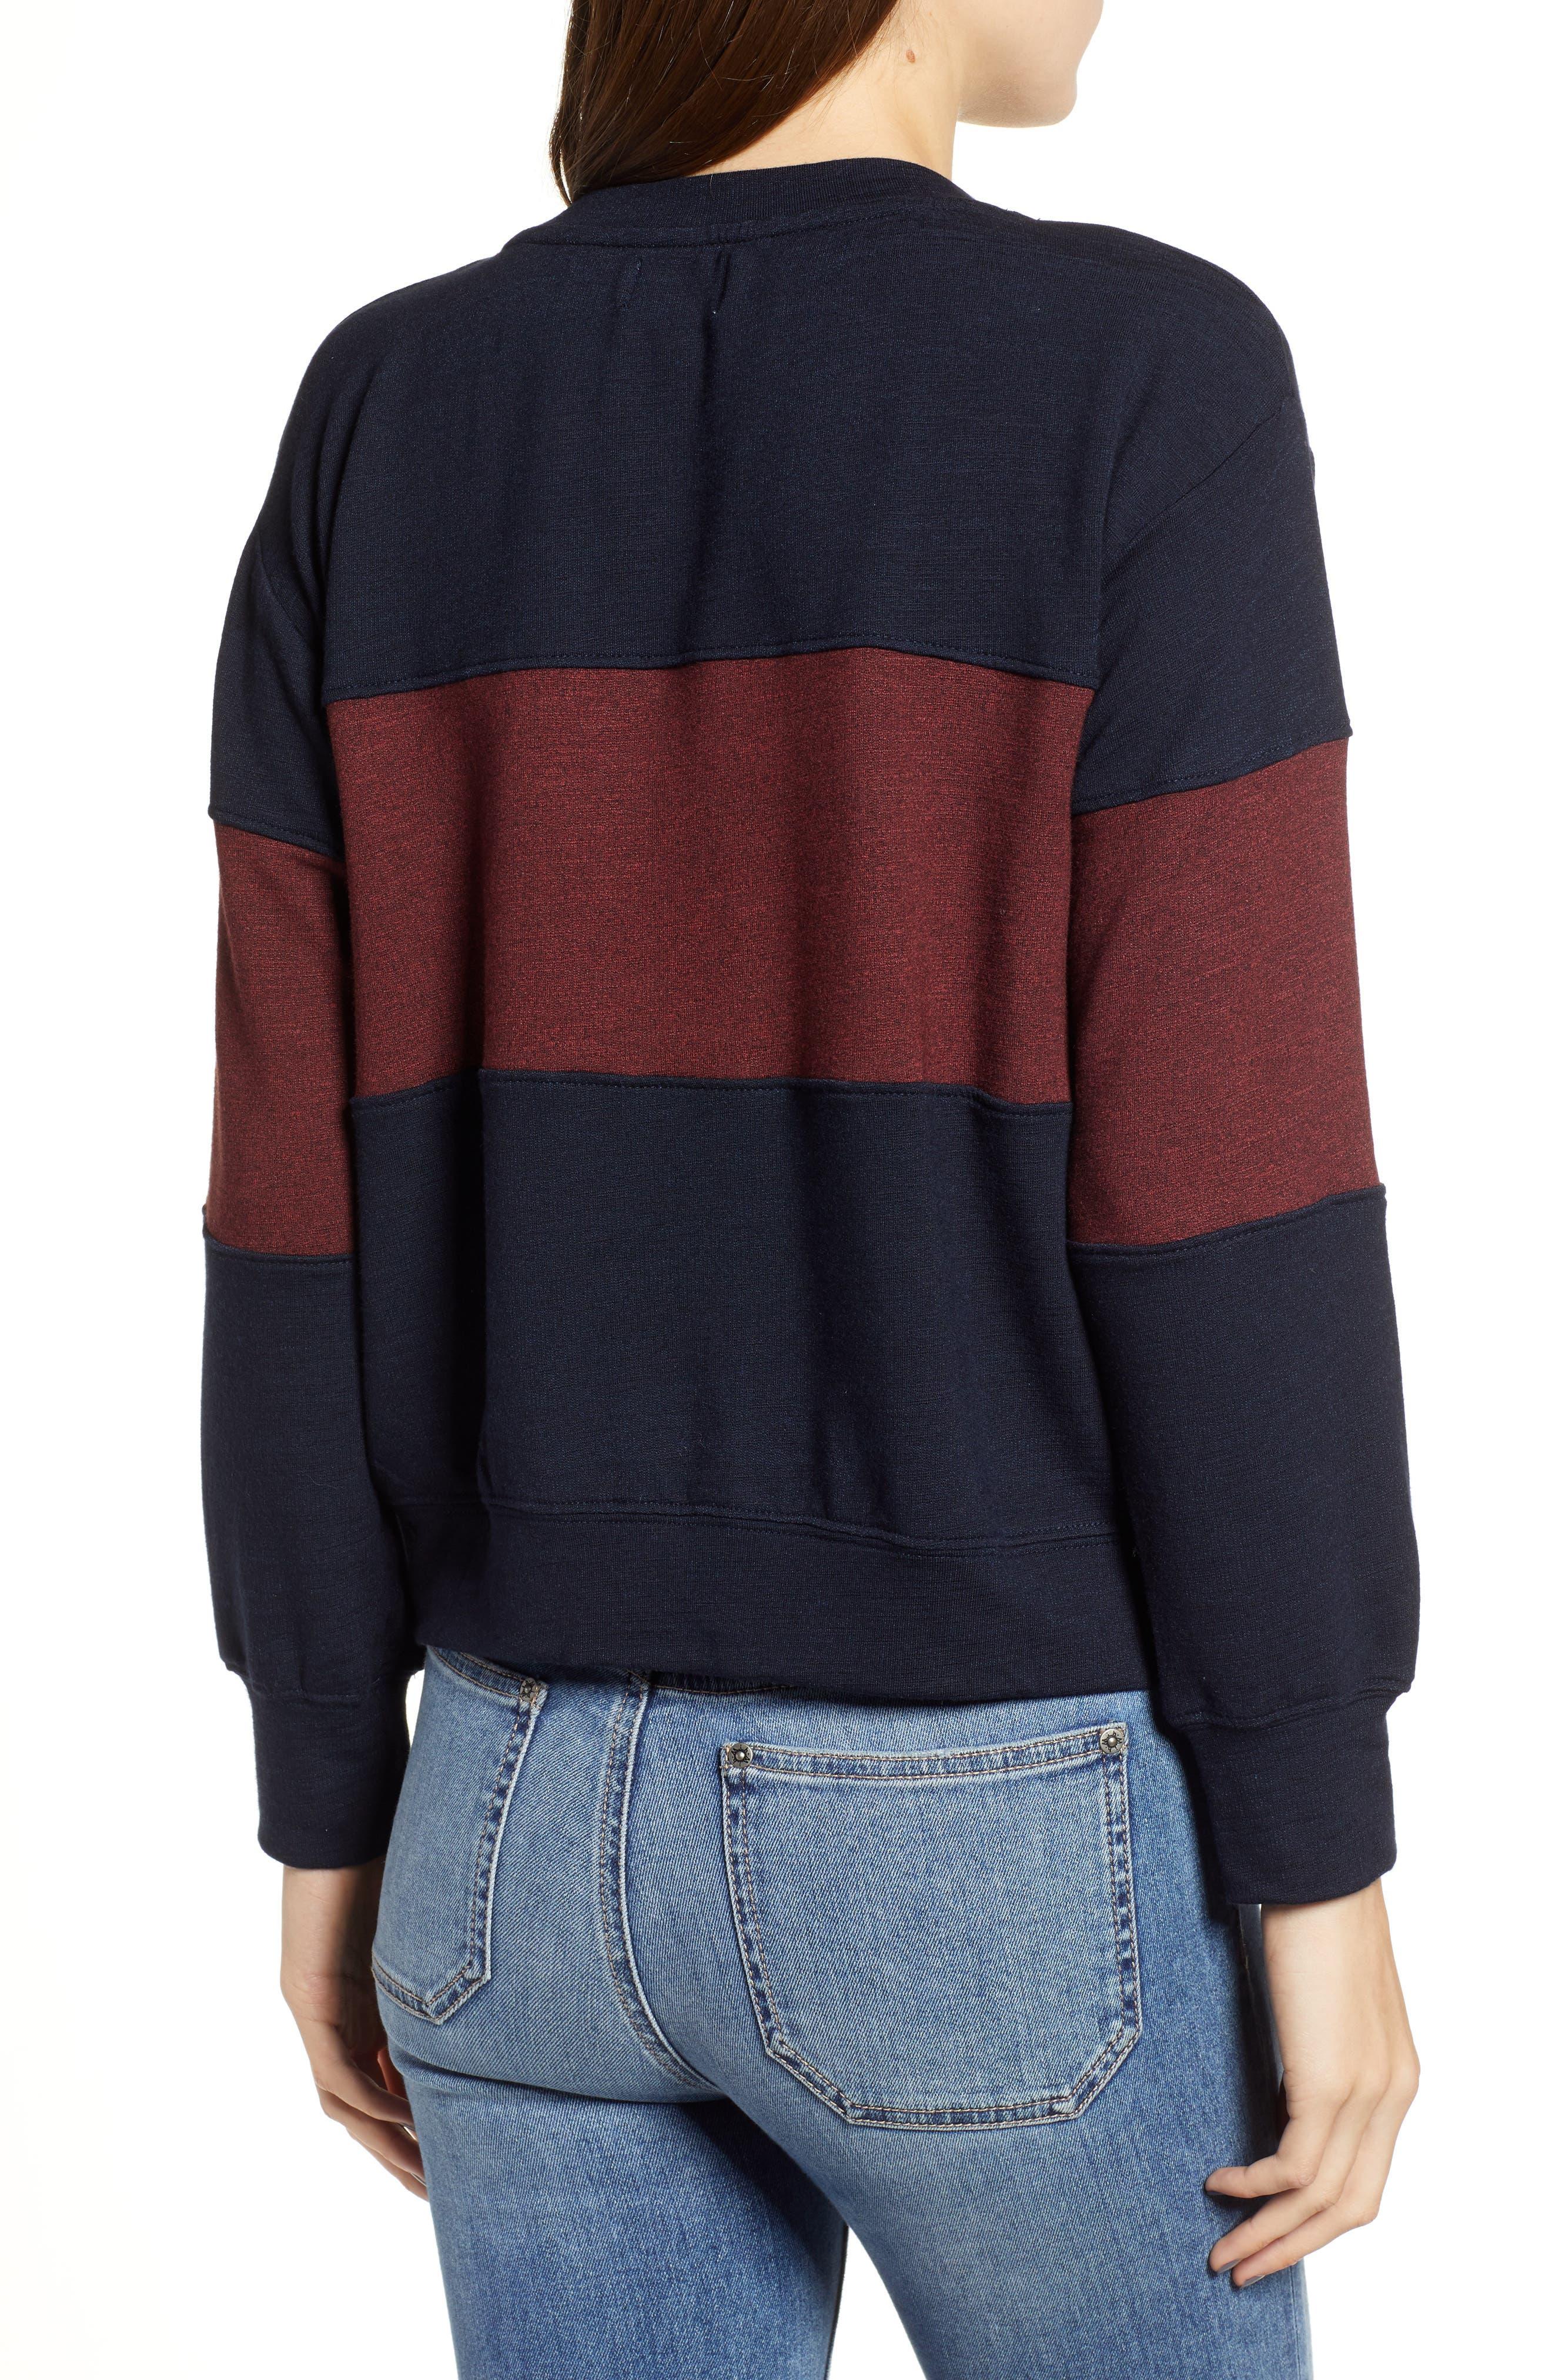 Colorblock Crop Sweatshirt,                             Alternate thumbnail 2, color,                             MIDNIGHT/ MARSALA